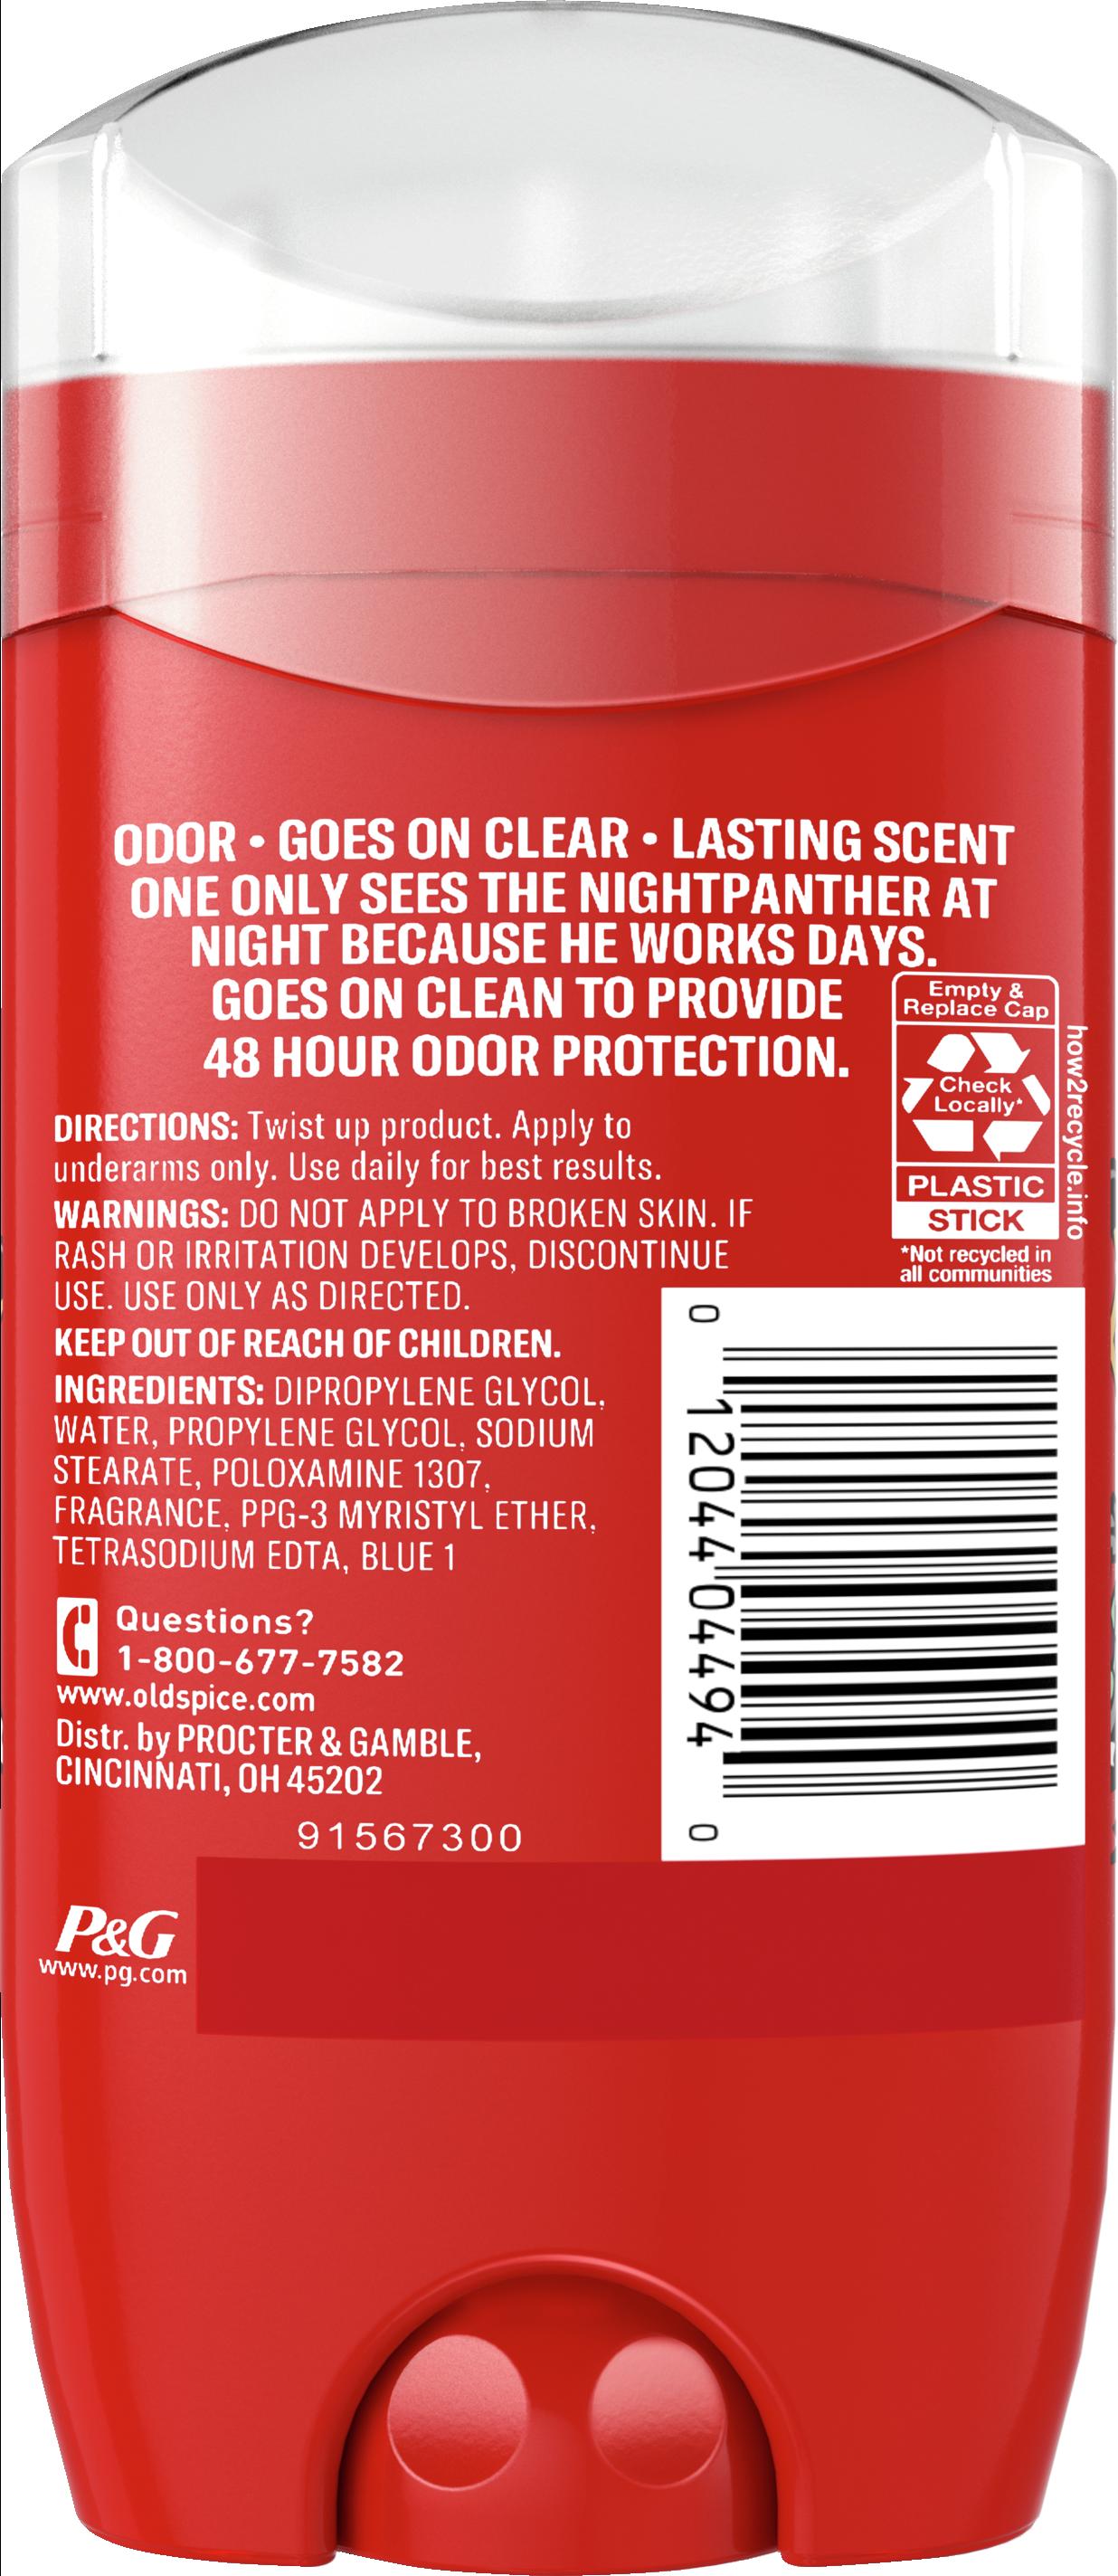 NightPanther Deodorant